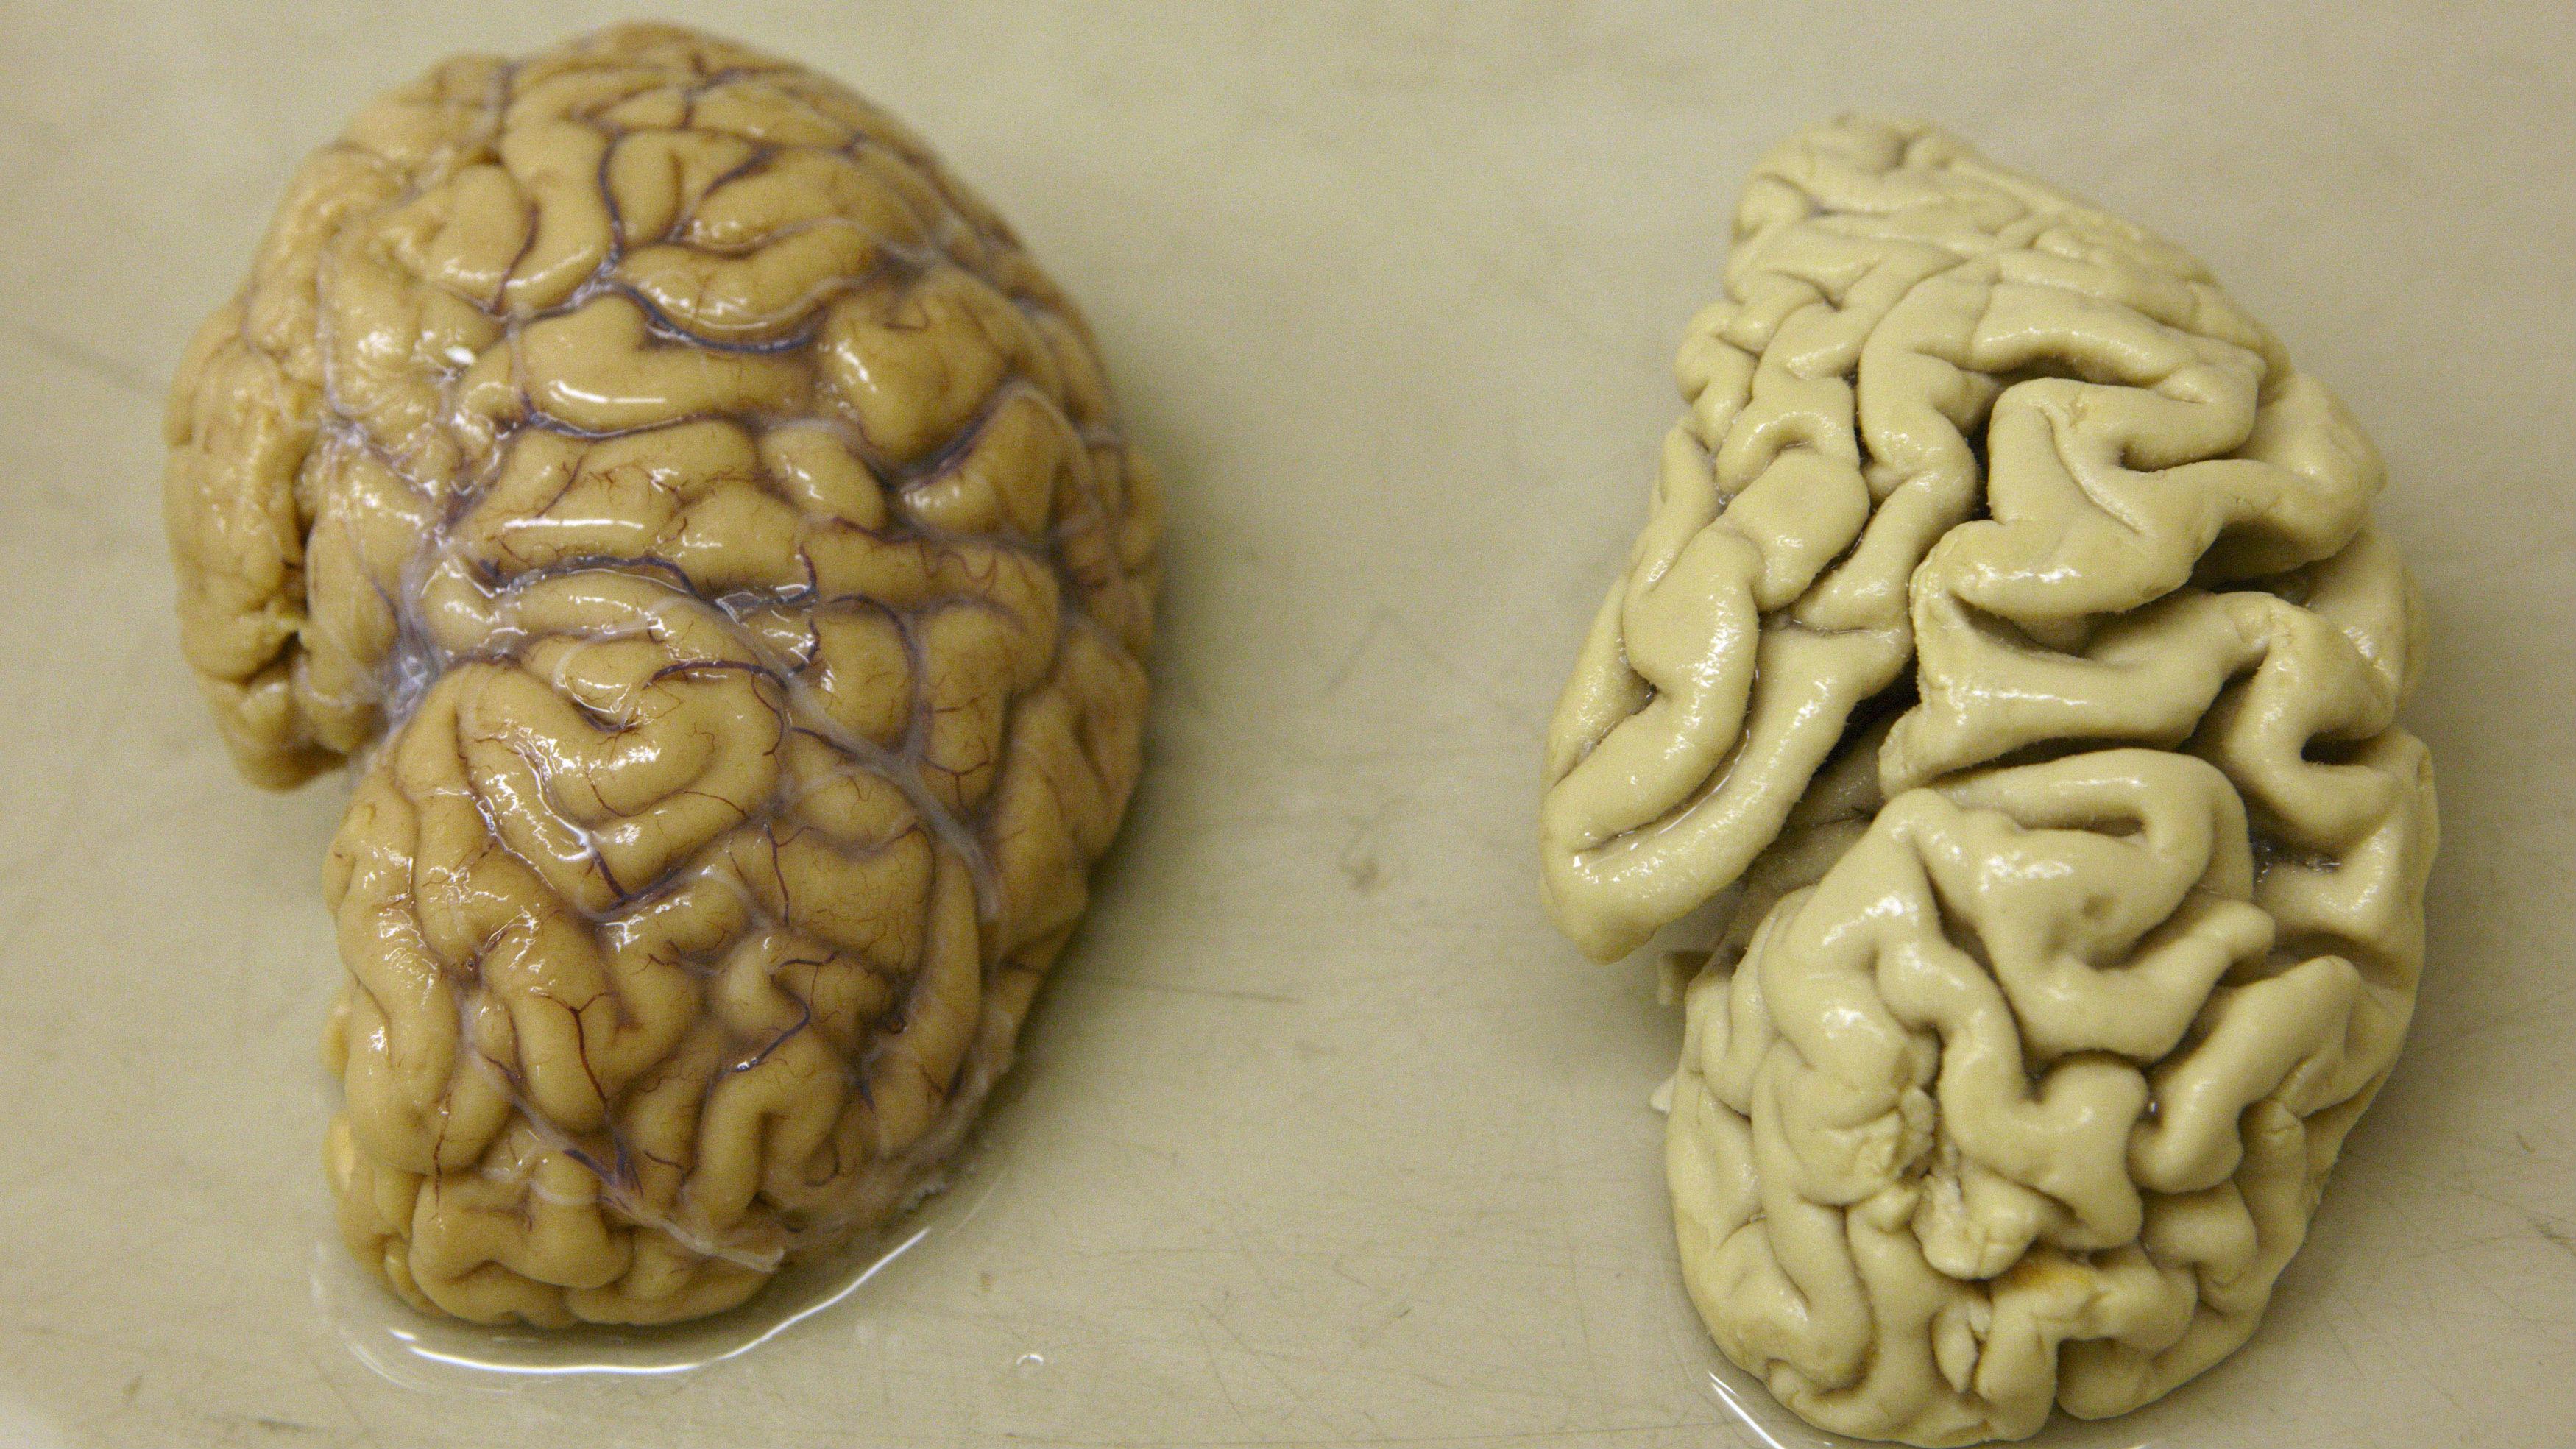 A healthy brain next to a brain with Alzheimer's disease.